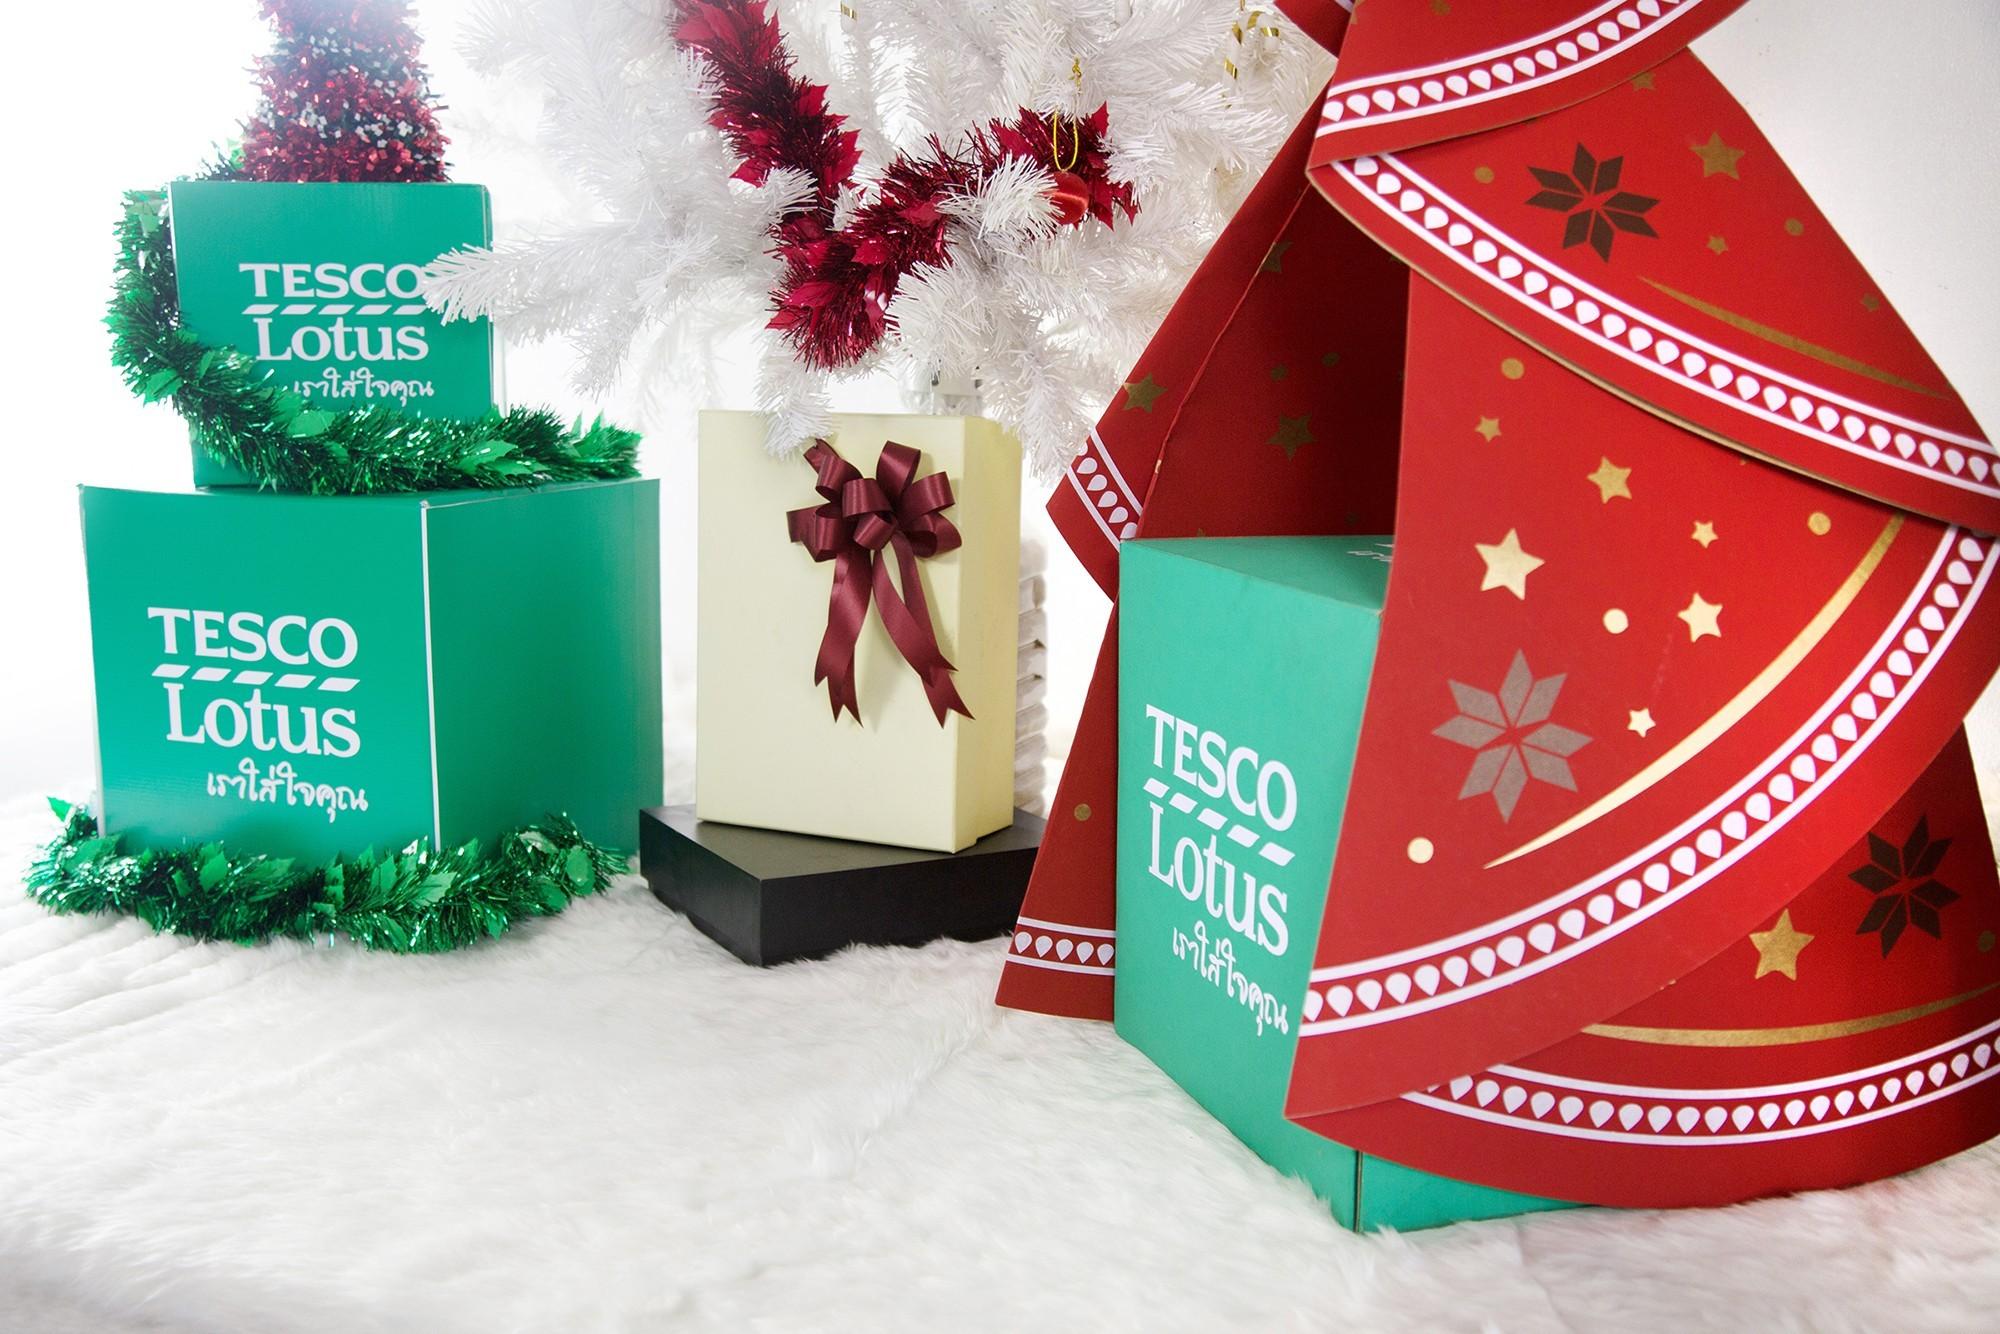 Prompt Design – Tesco Lotus Christmas Tree Gift Set Box